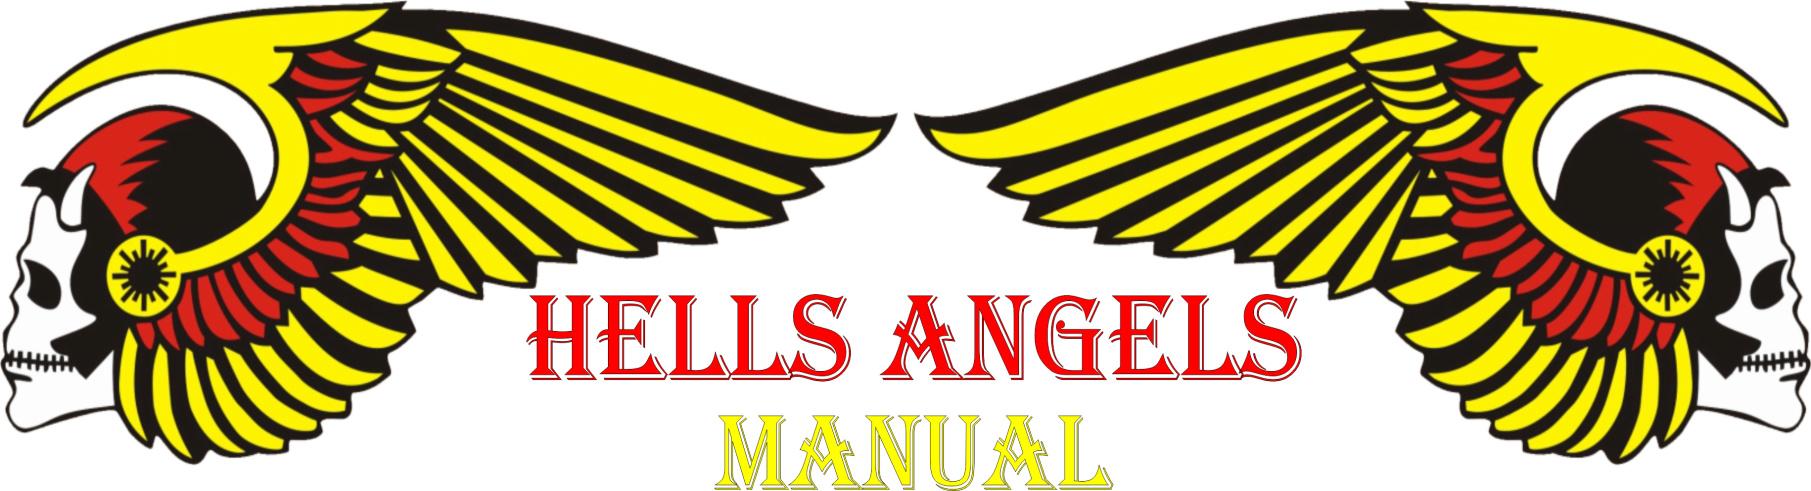 MANUAL Manual11